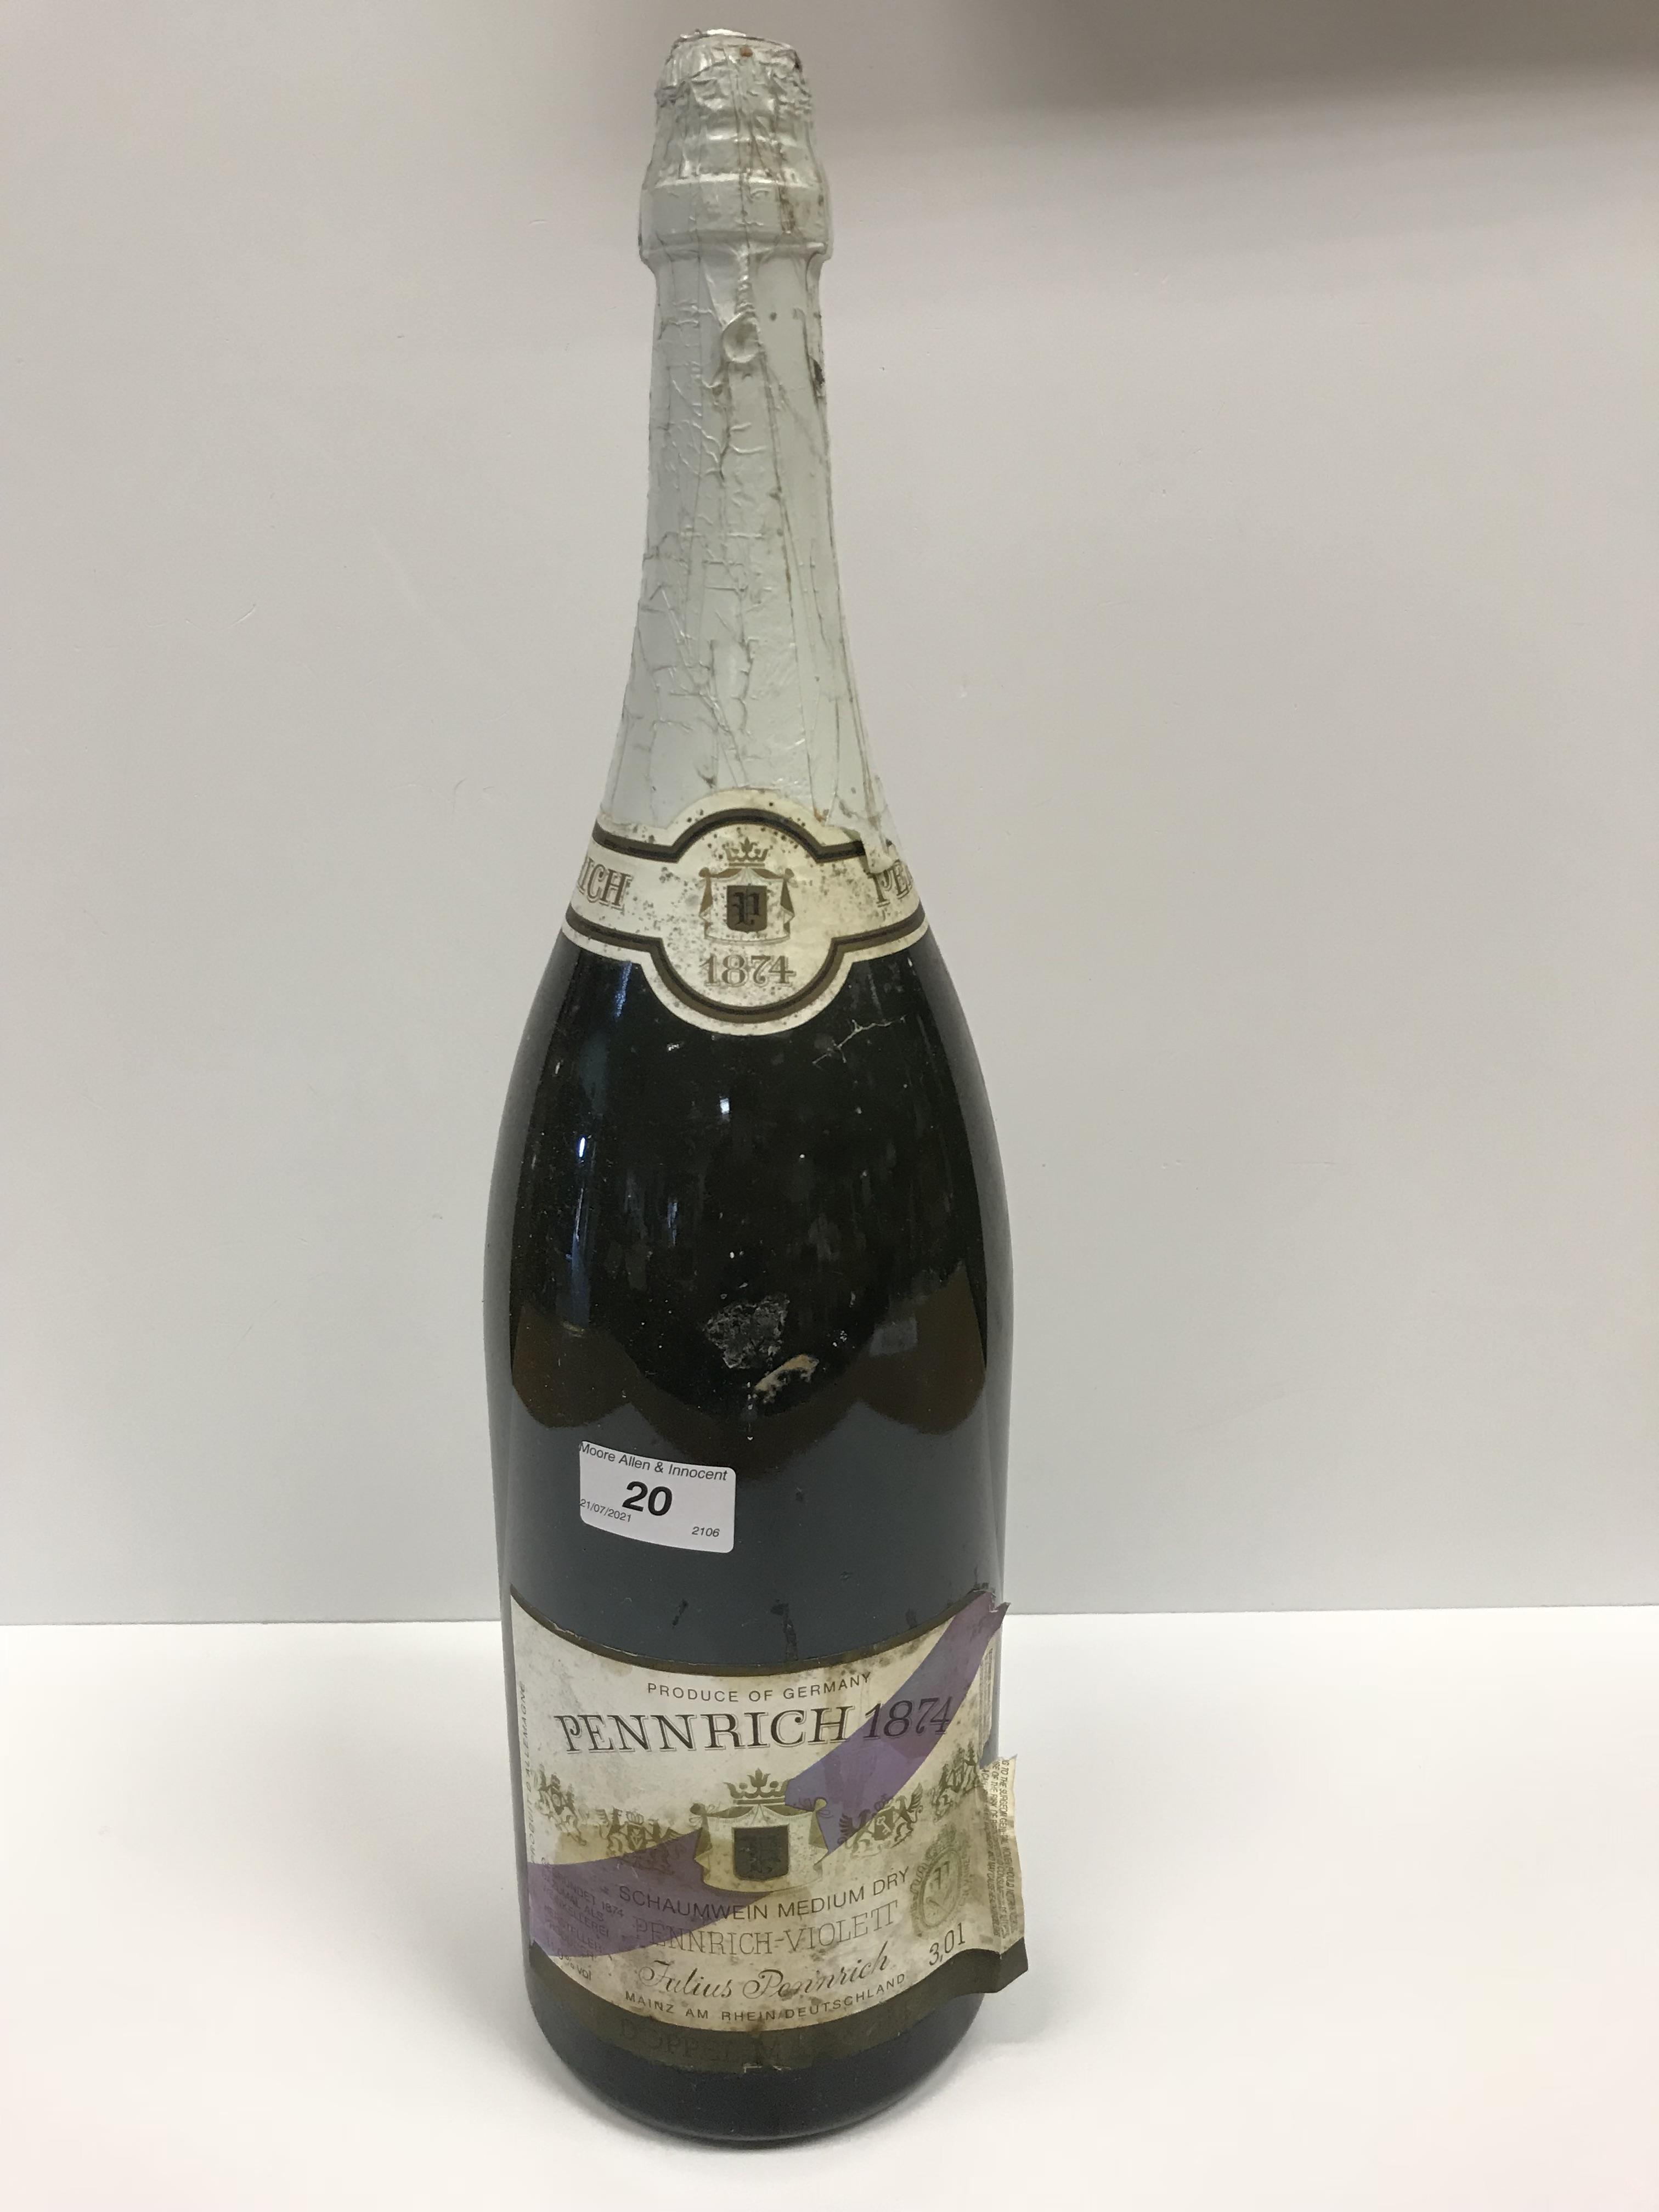 "Pennrich 1874 German Medium Dry White Wine ""Penrich Violett"", double magnum, 3 litre - Image 2 of 2"